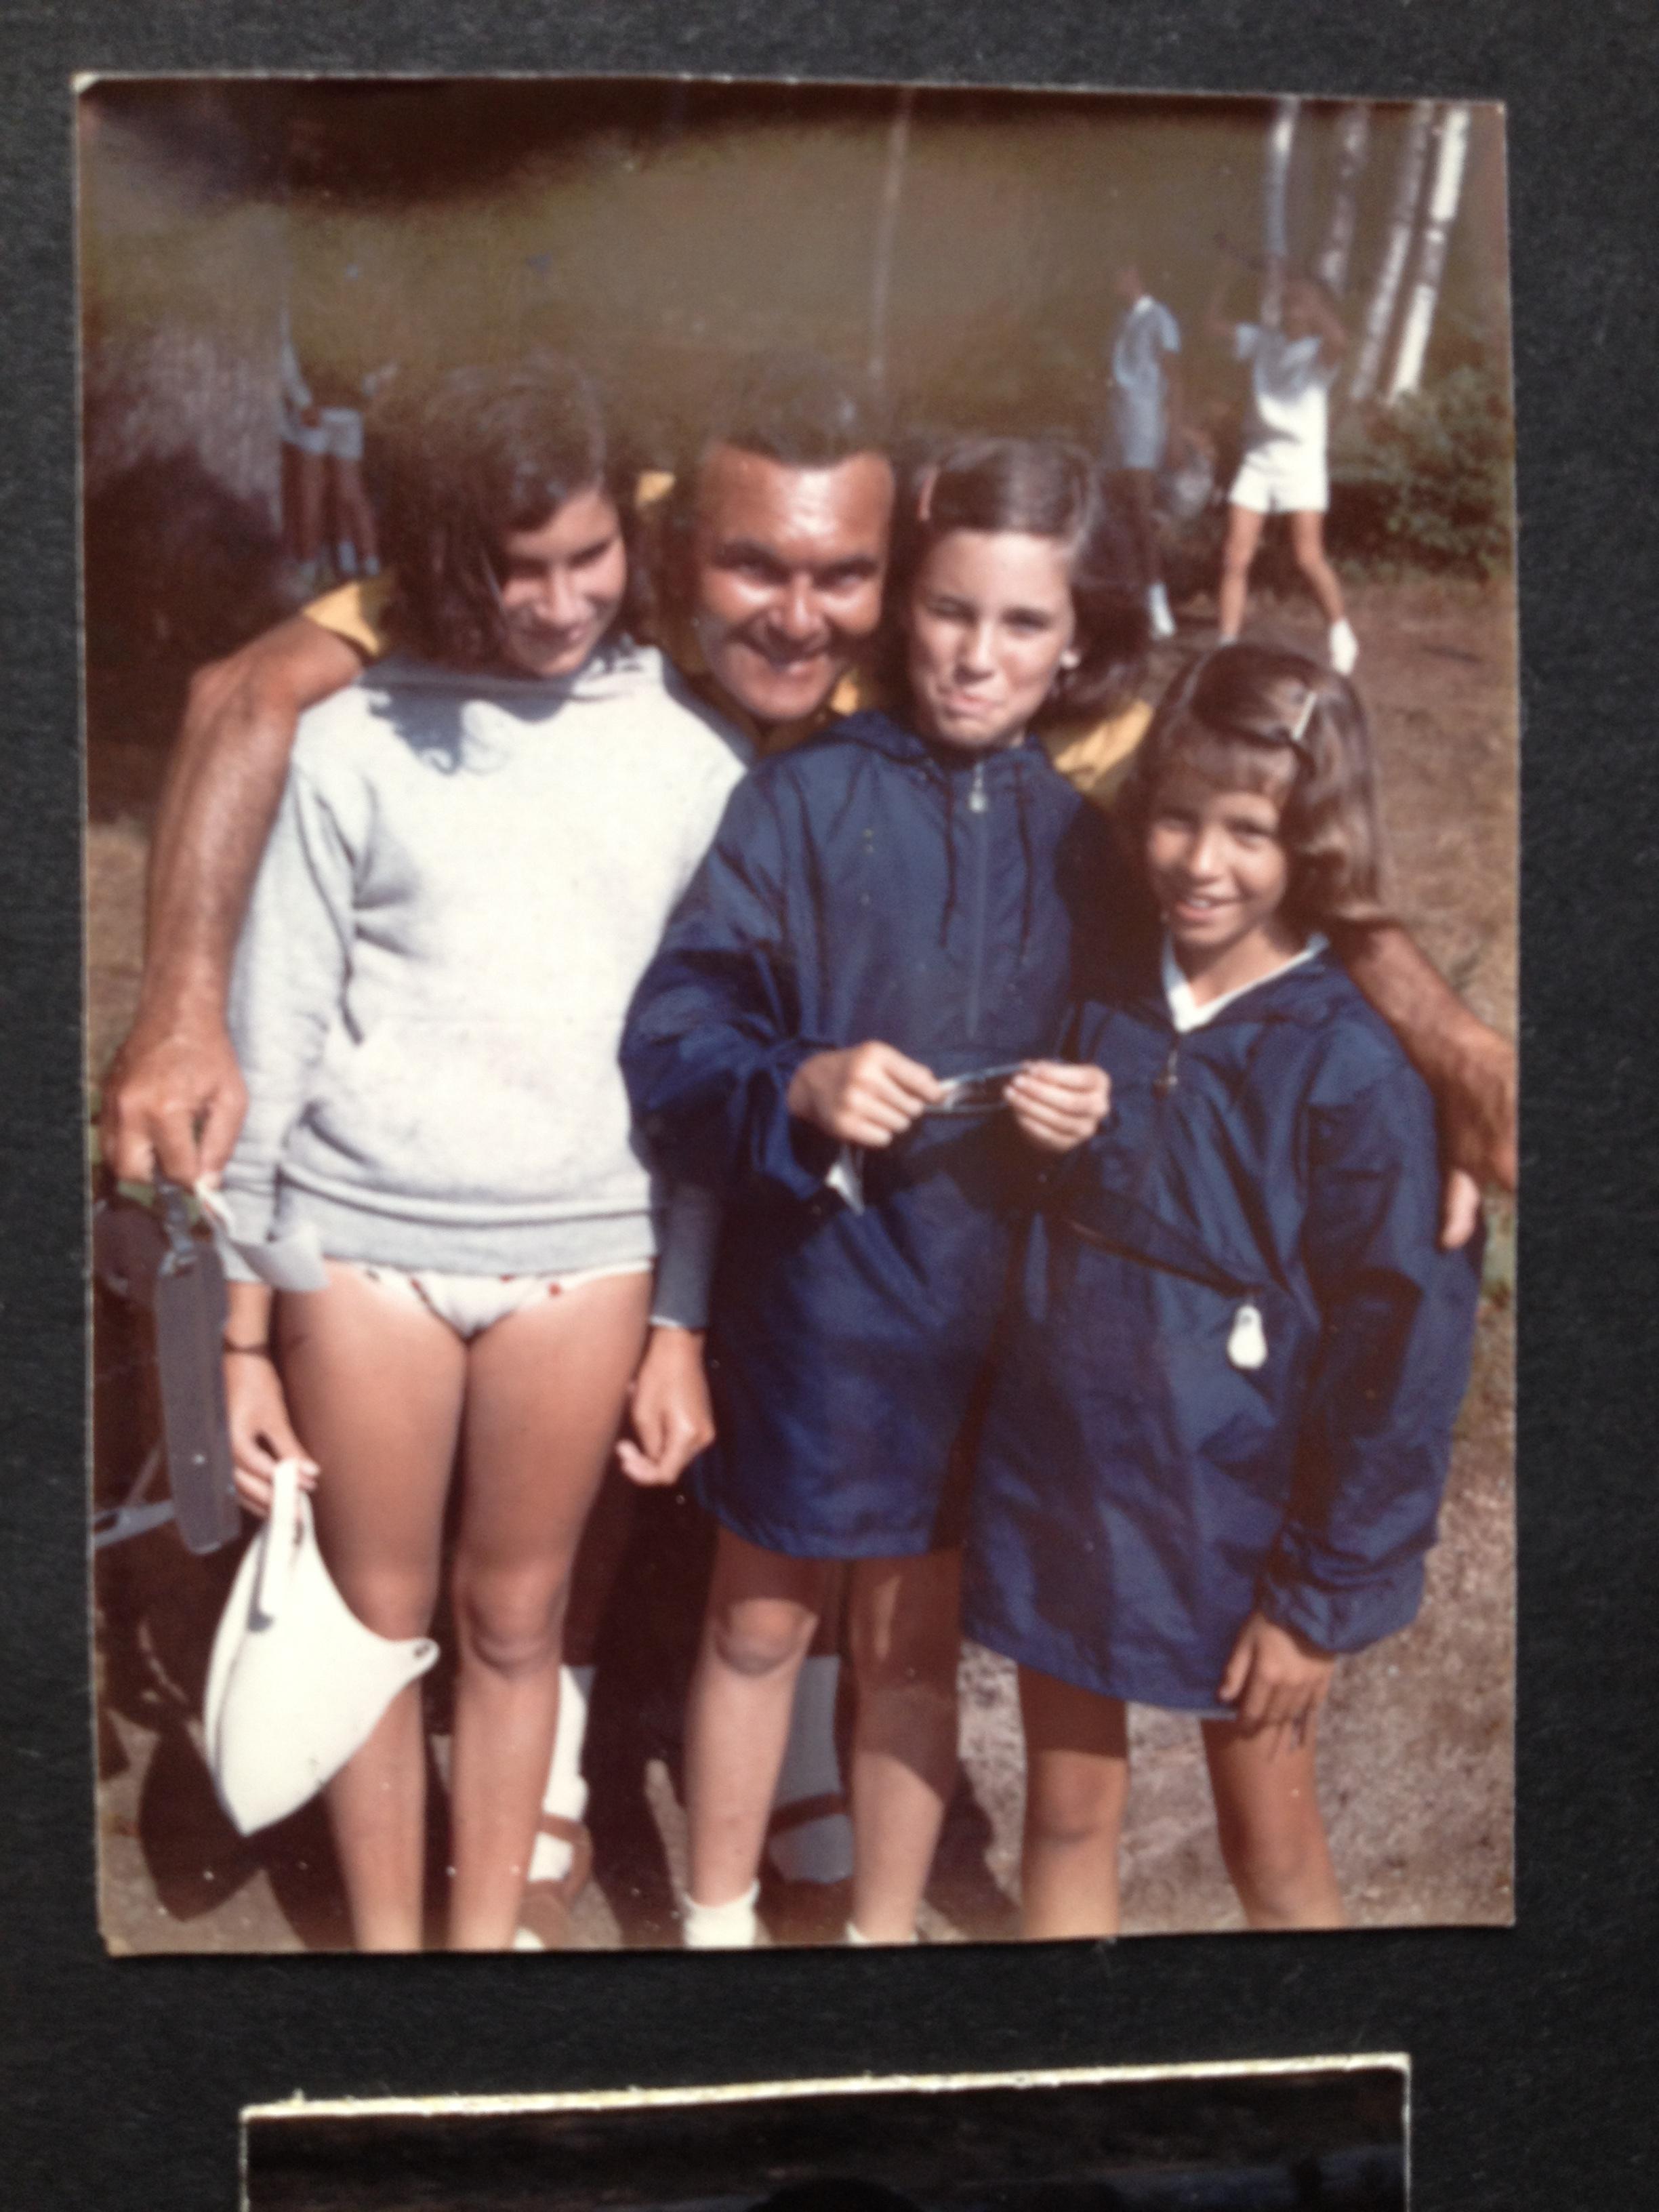 Si and Susan Miller with Kim Klausner and Karen Freedman at Camp Trebor in Maine